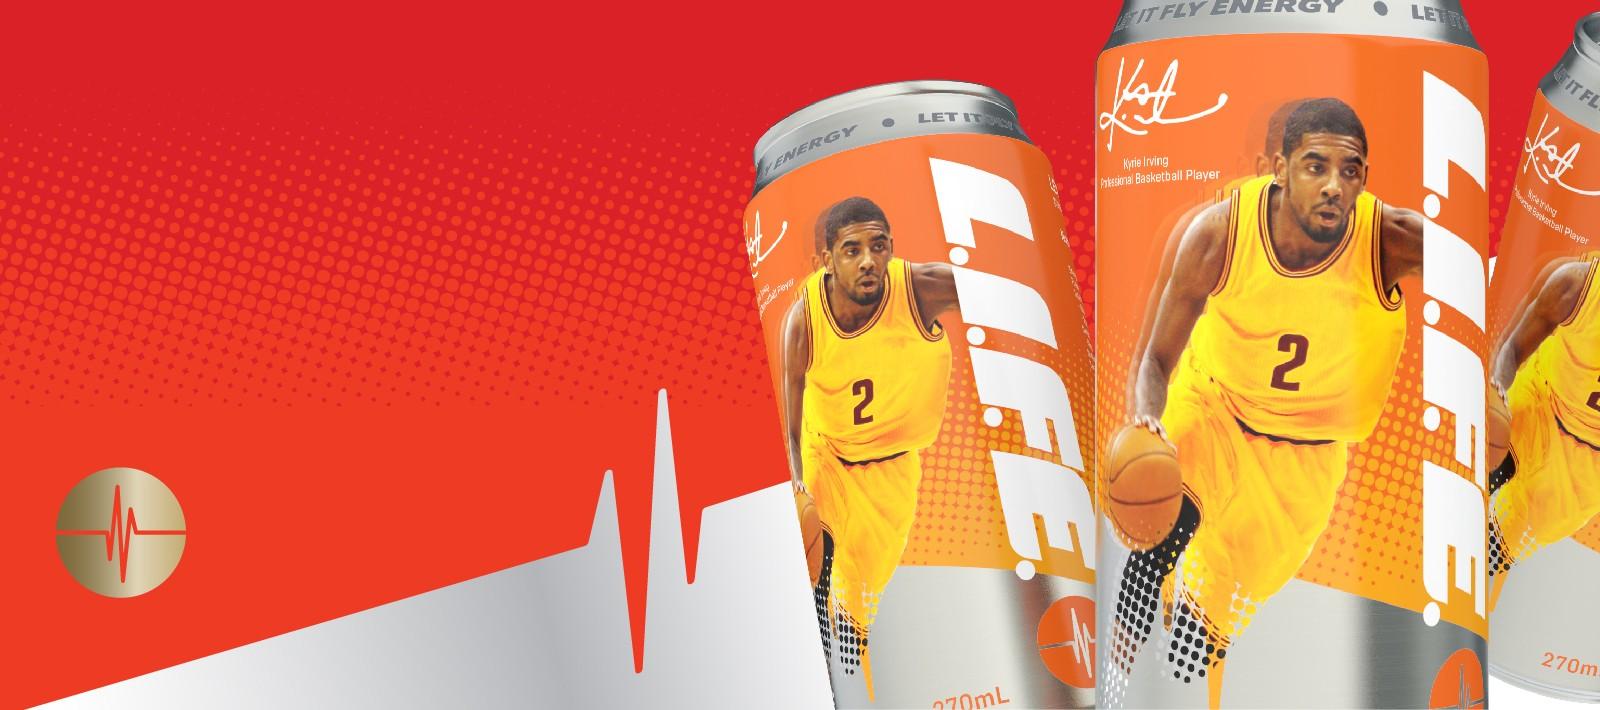 Life-beverage-brand-strategy-2